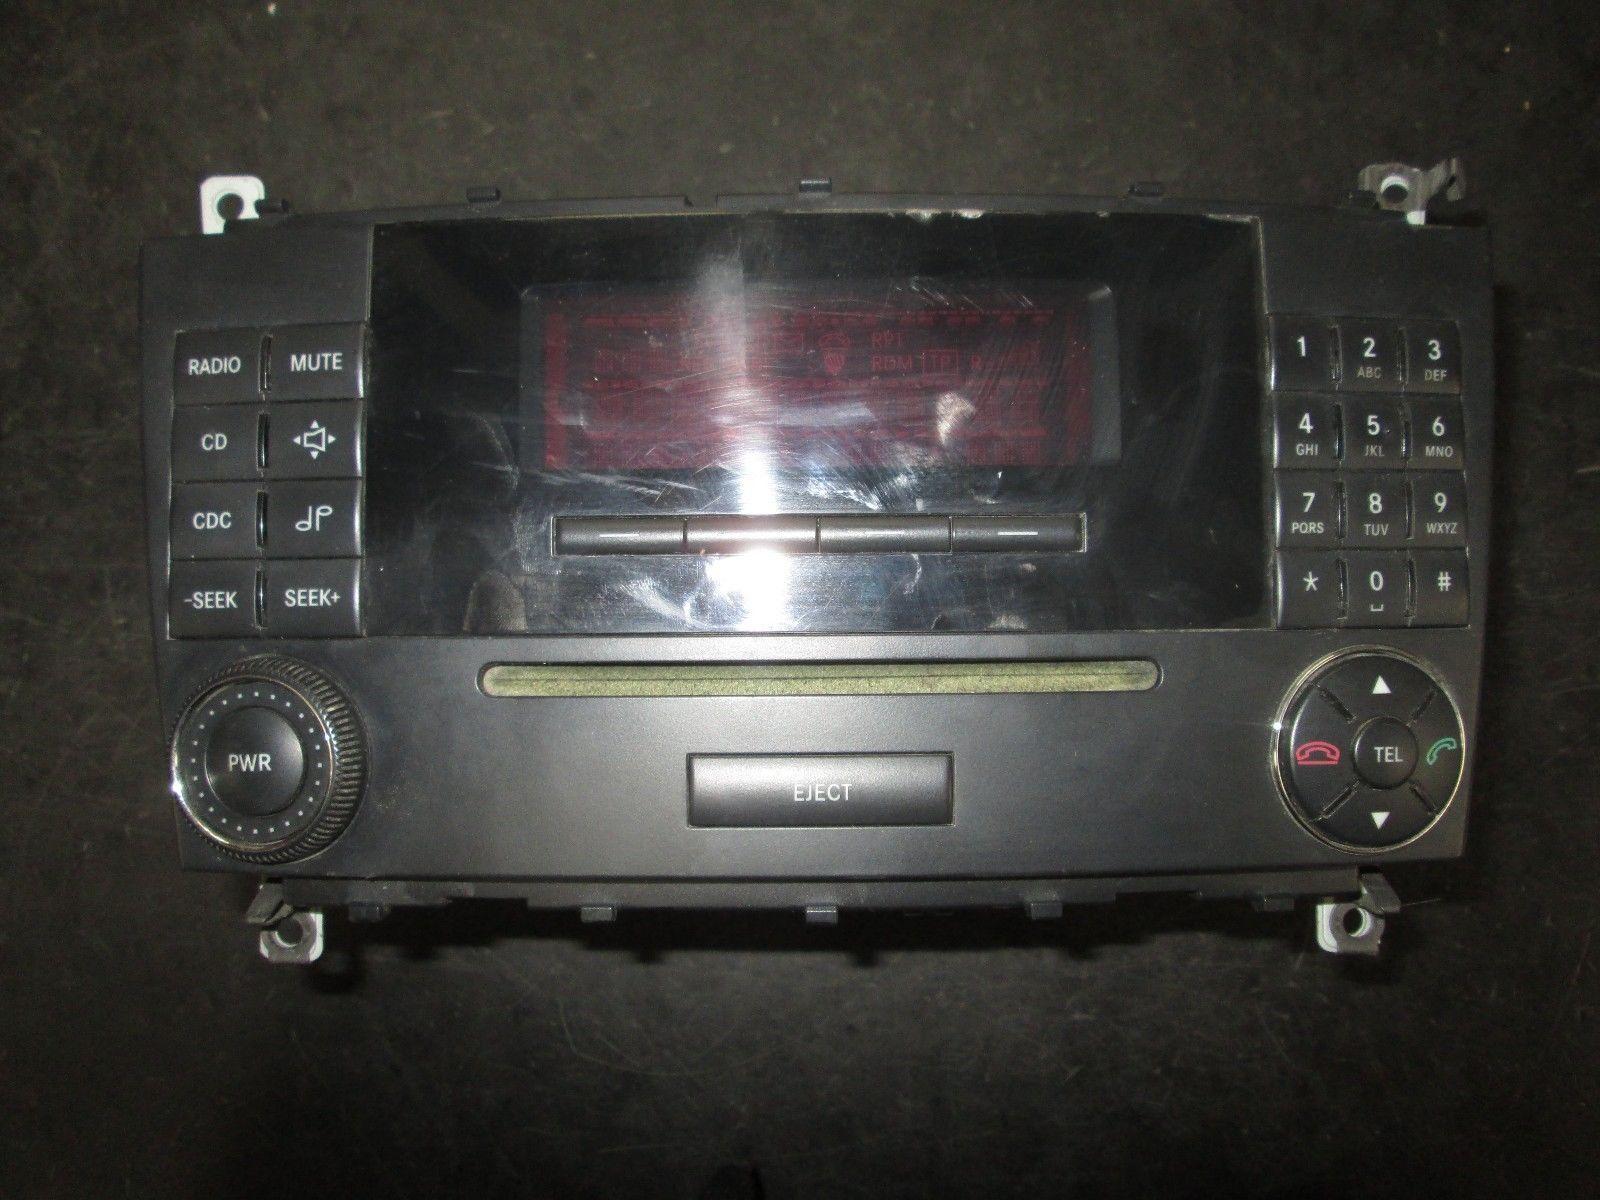 05 06 07 MERCEDES C CLASS RADIO CD PLAYER #A2038705189 *See item description*